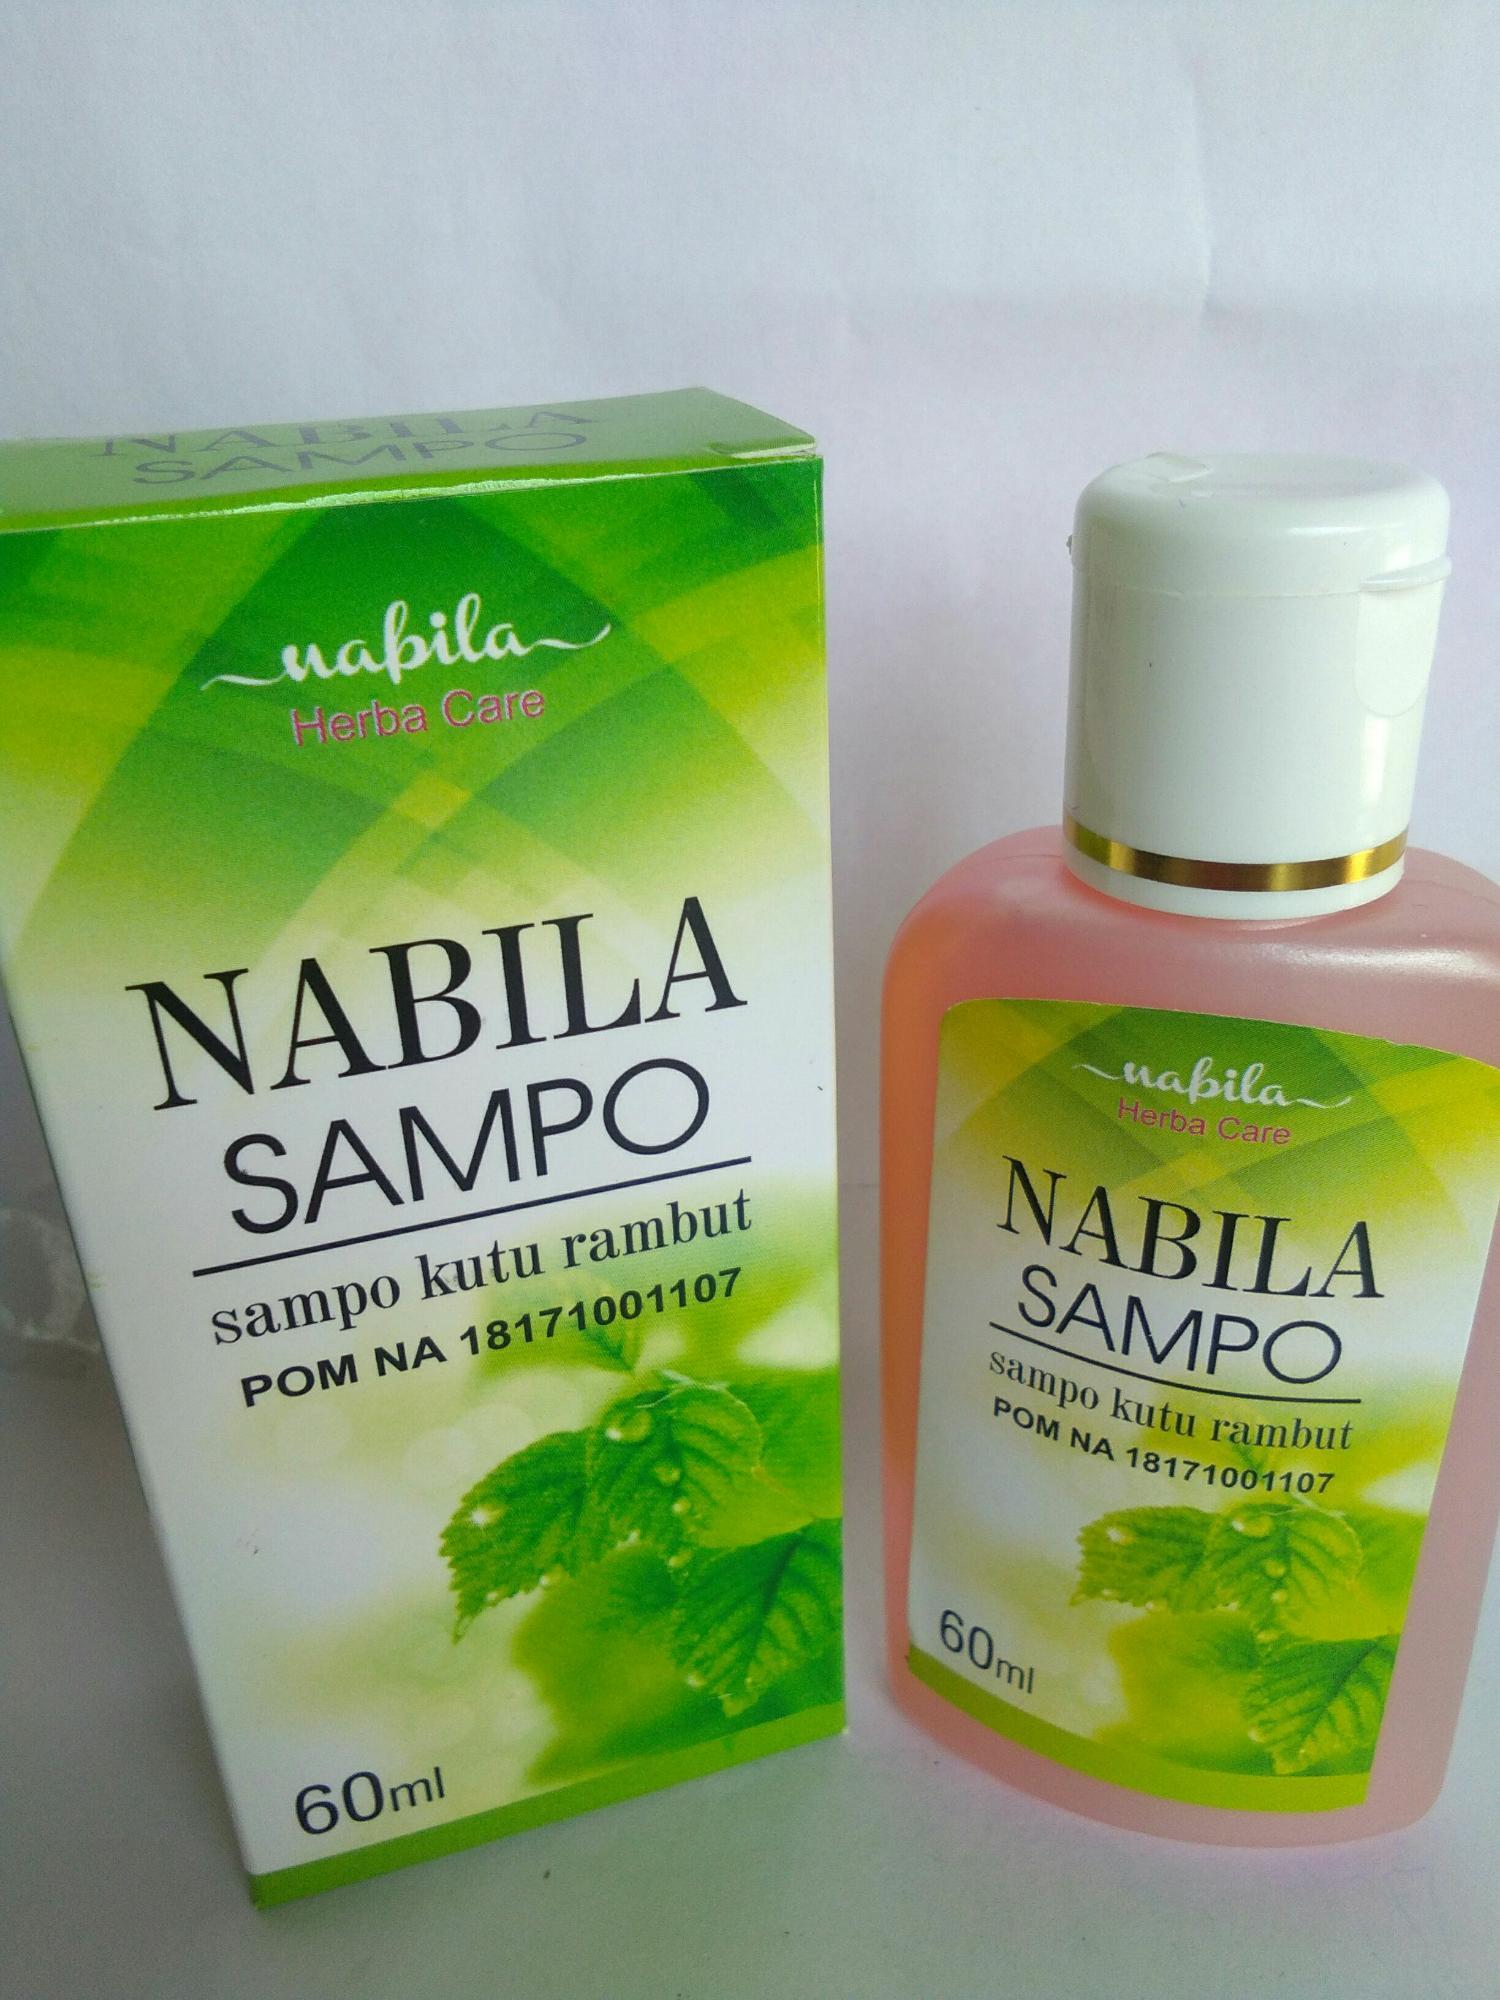 Kelebihan Selsun Gold Shampo Anti Ketombe 60ml Terkini Kutu Sampo Lice Nabila